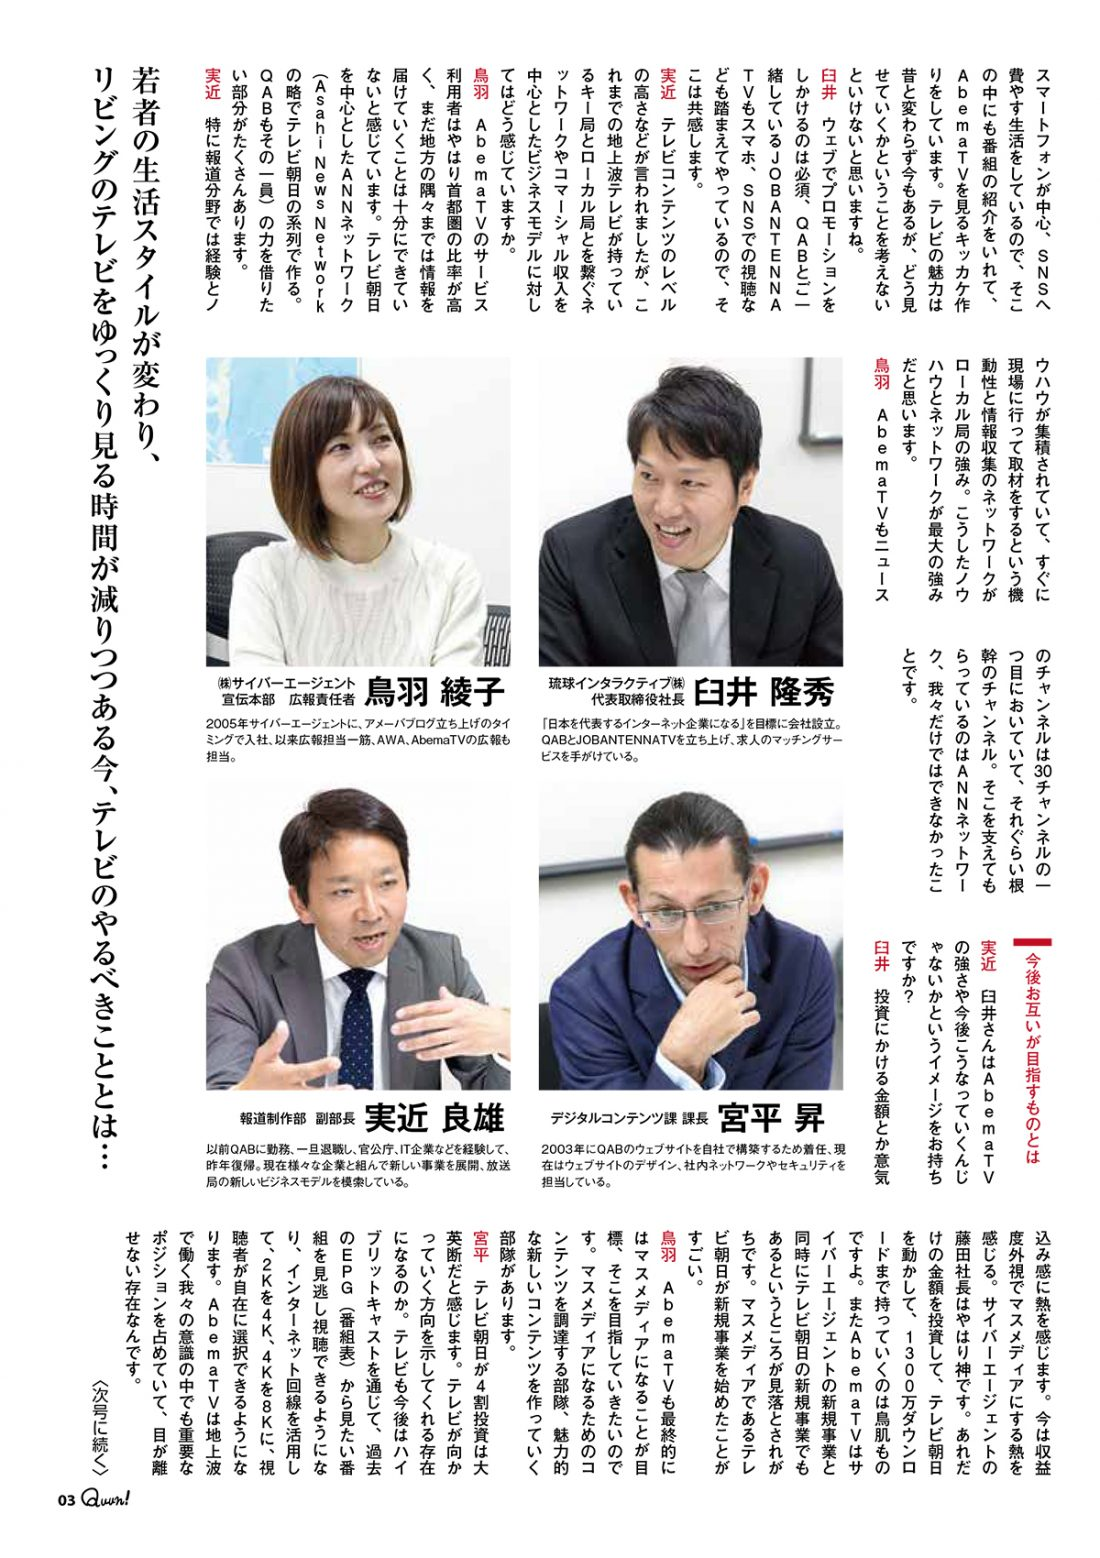 https://www.qab.co.jp/qgoro/wp-content/uploads/quun_0705-1100x1558.jpg